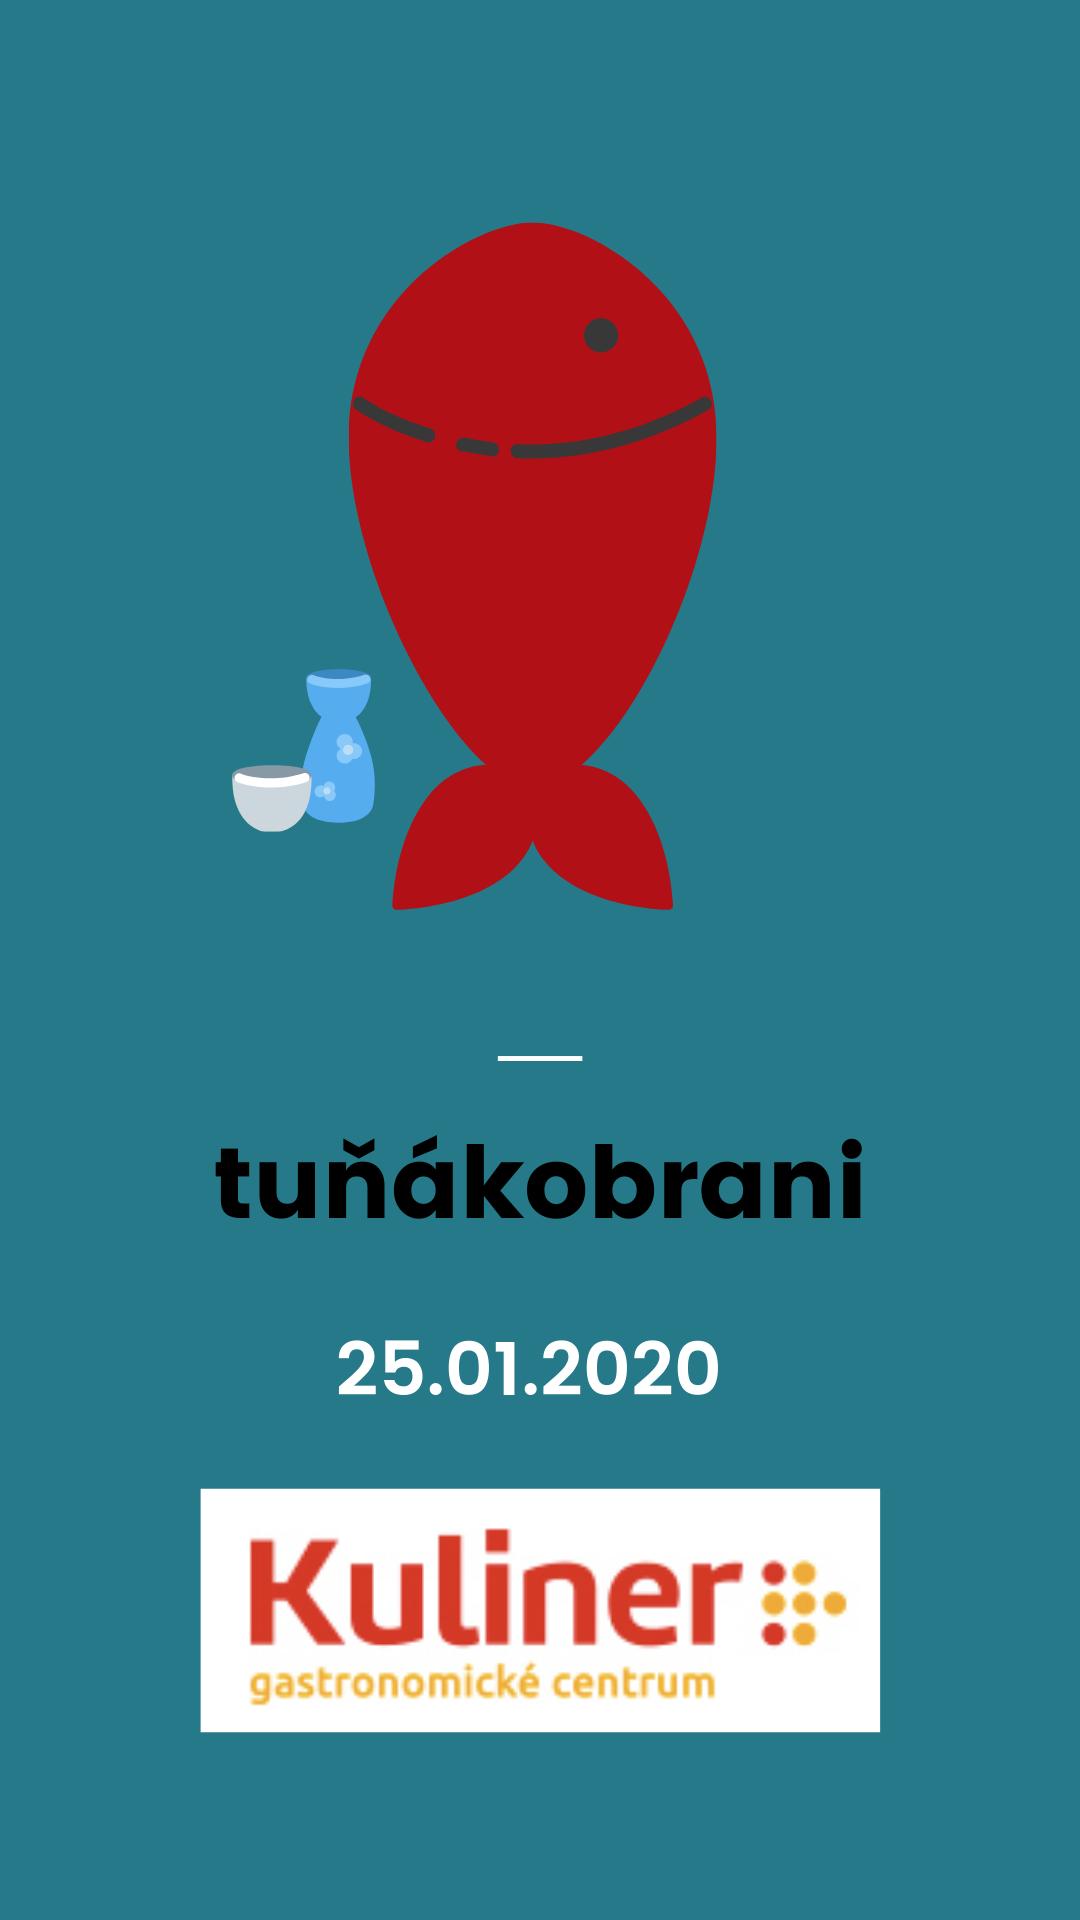 tunakobrani new (2)